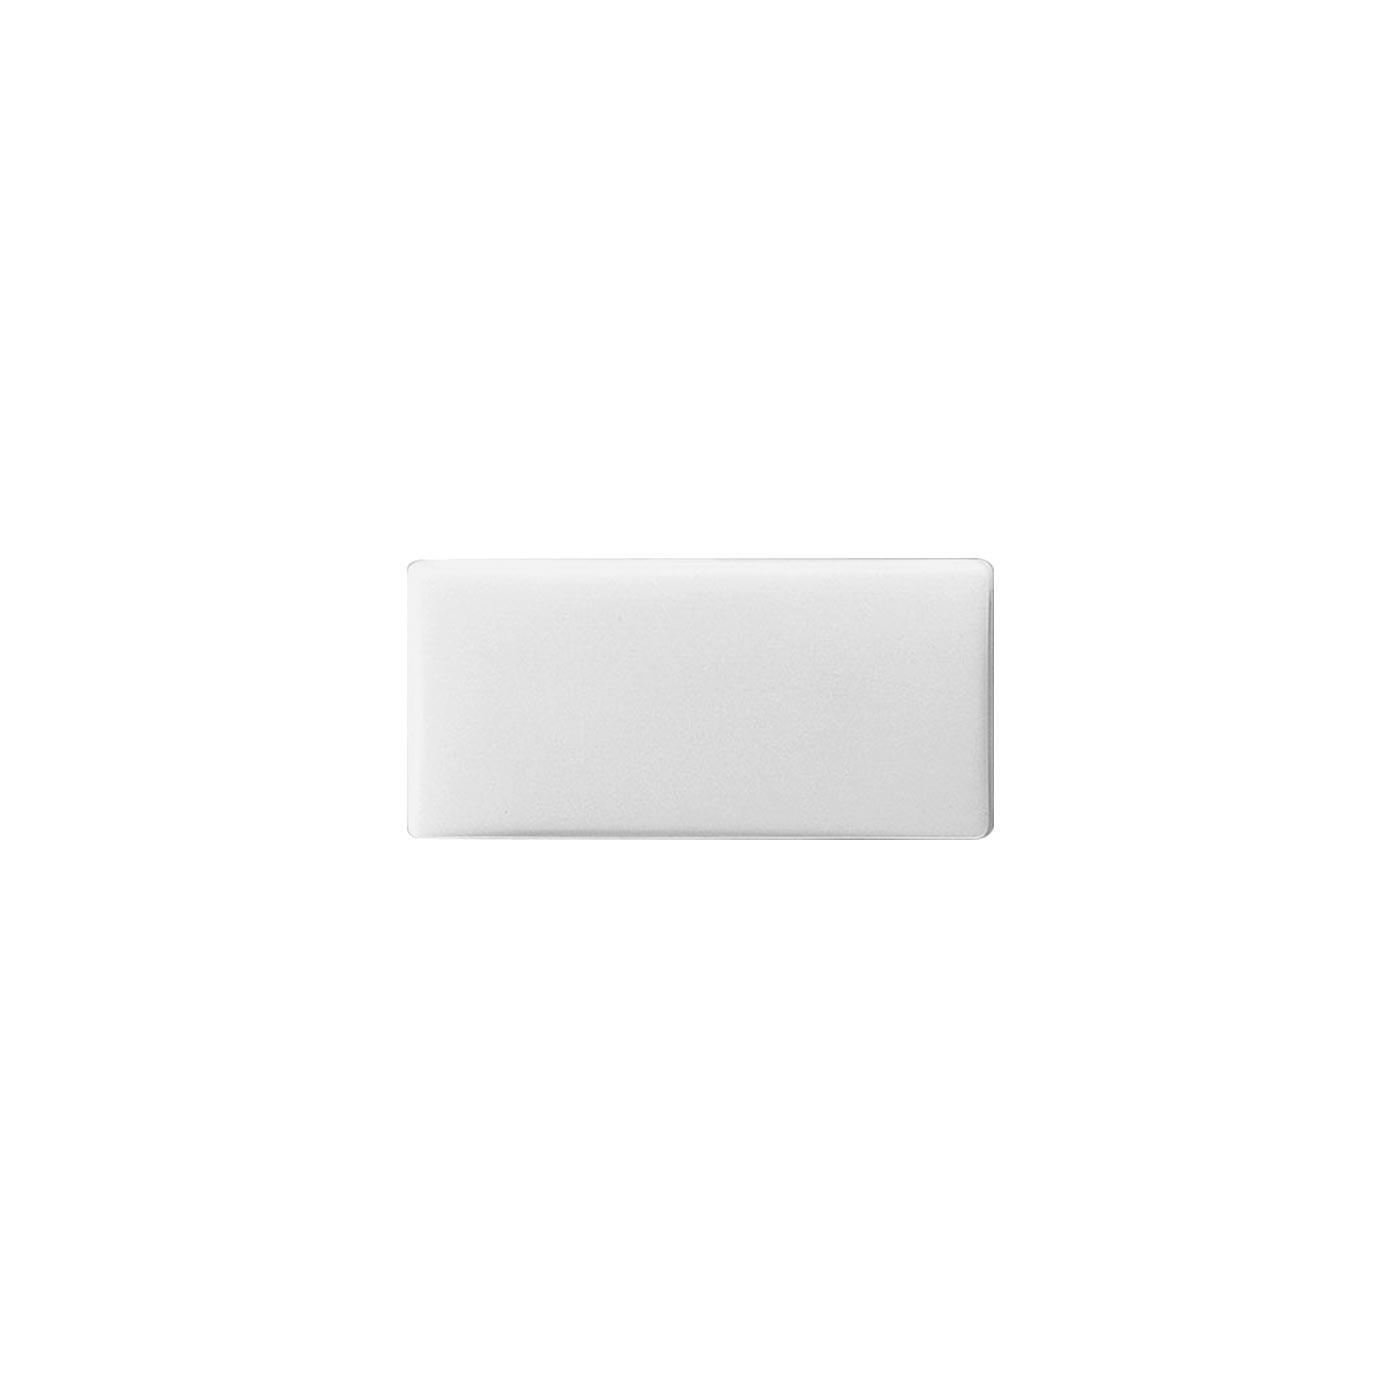 Bega 34161 / 34162 / 34786 Wand-/Deckenleuchte, rechteckig